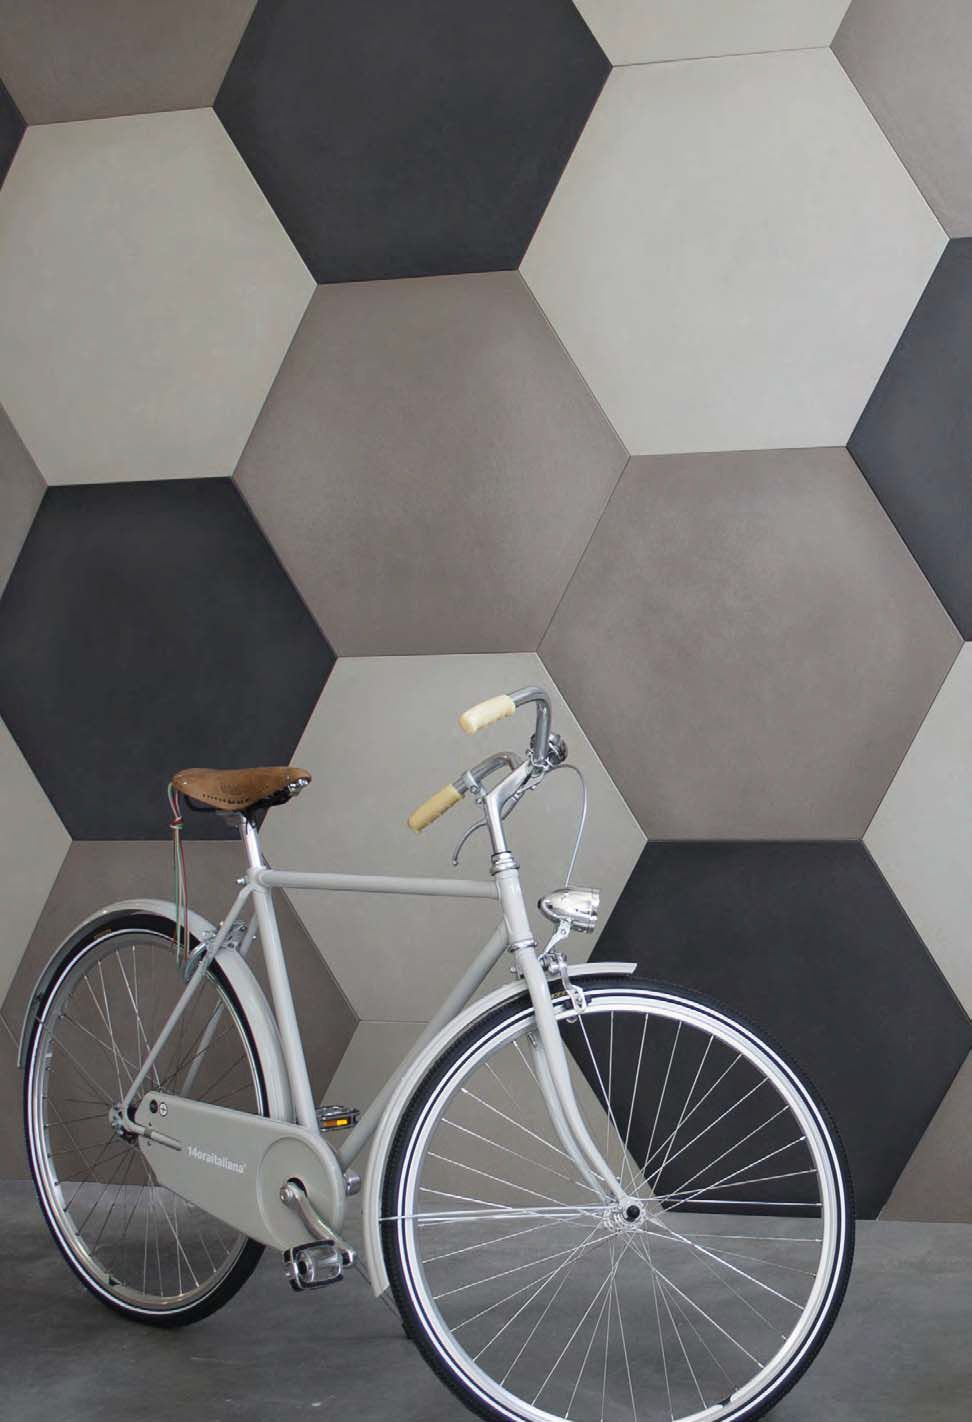 Cement wallfloor tiles cemento14 esagoni cemento14 collection by cement wallfloor tiles cemento14 esagoni cemento14 collection by 14oraitaliana dailygadgetfo Images